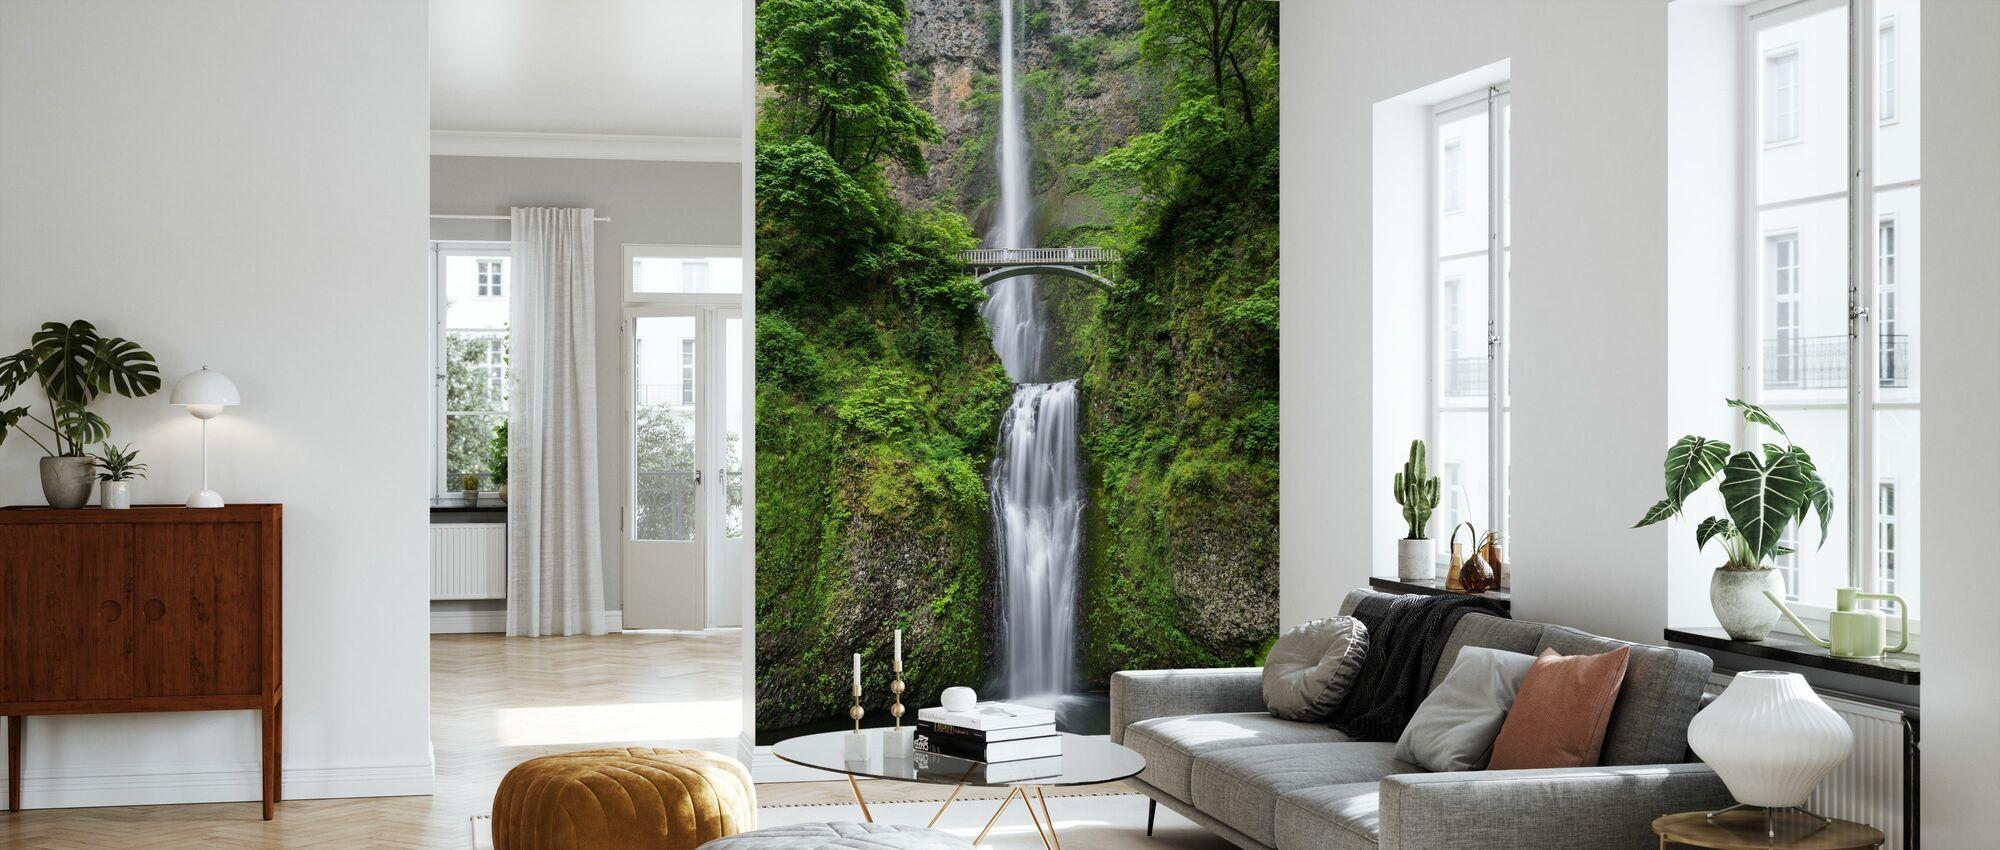 Bridge and Waterfall - Wallpaper - Living Room